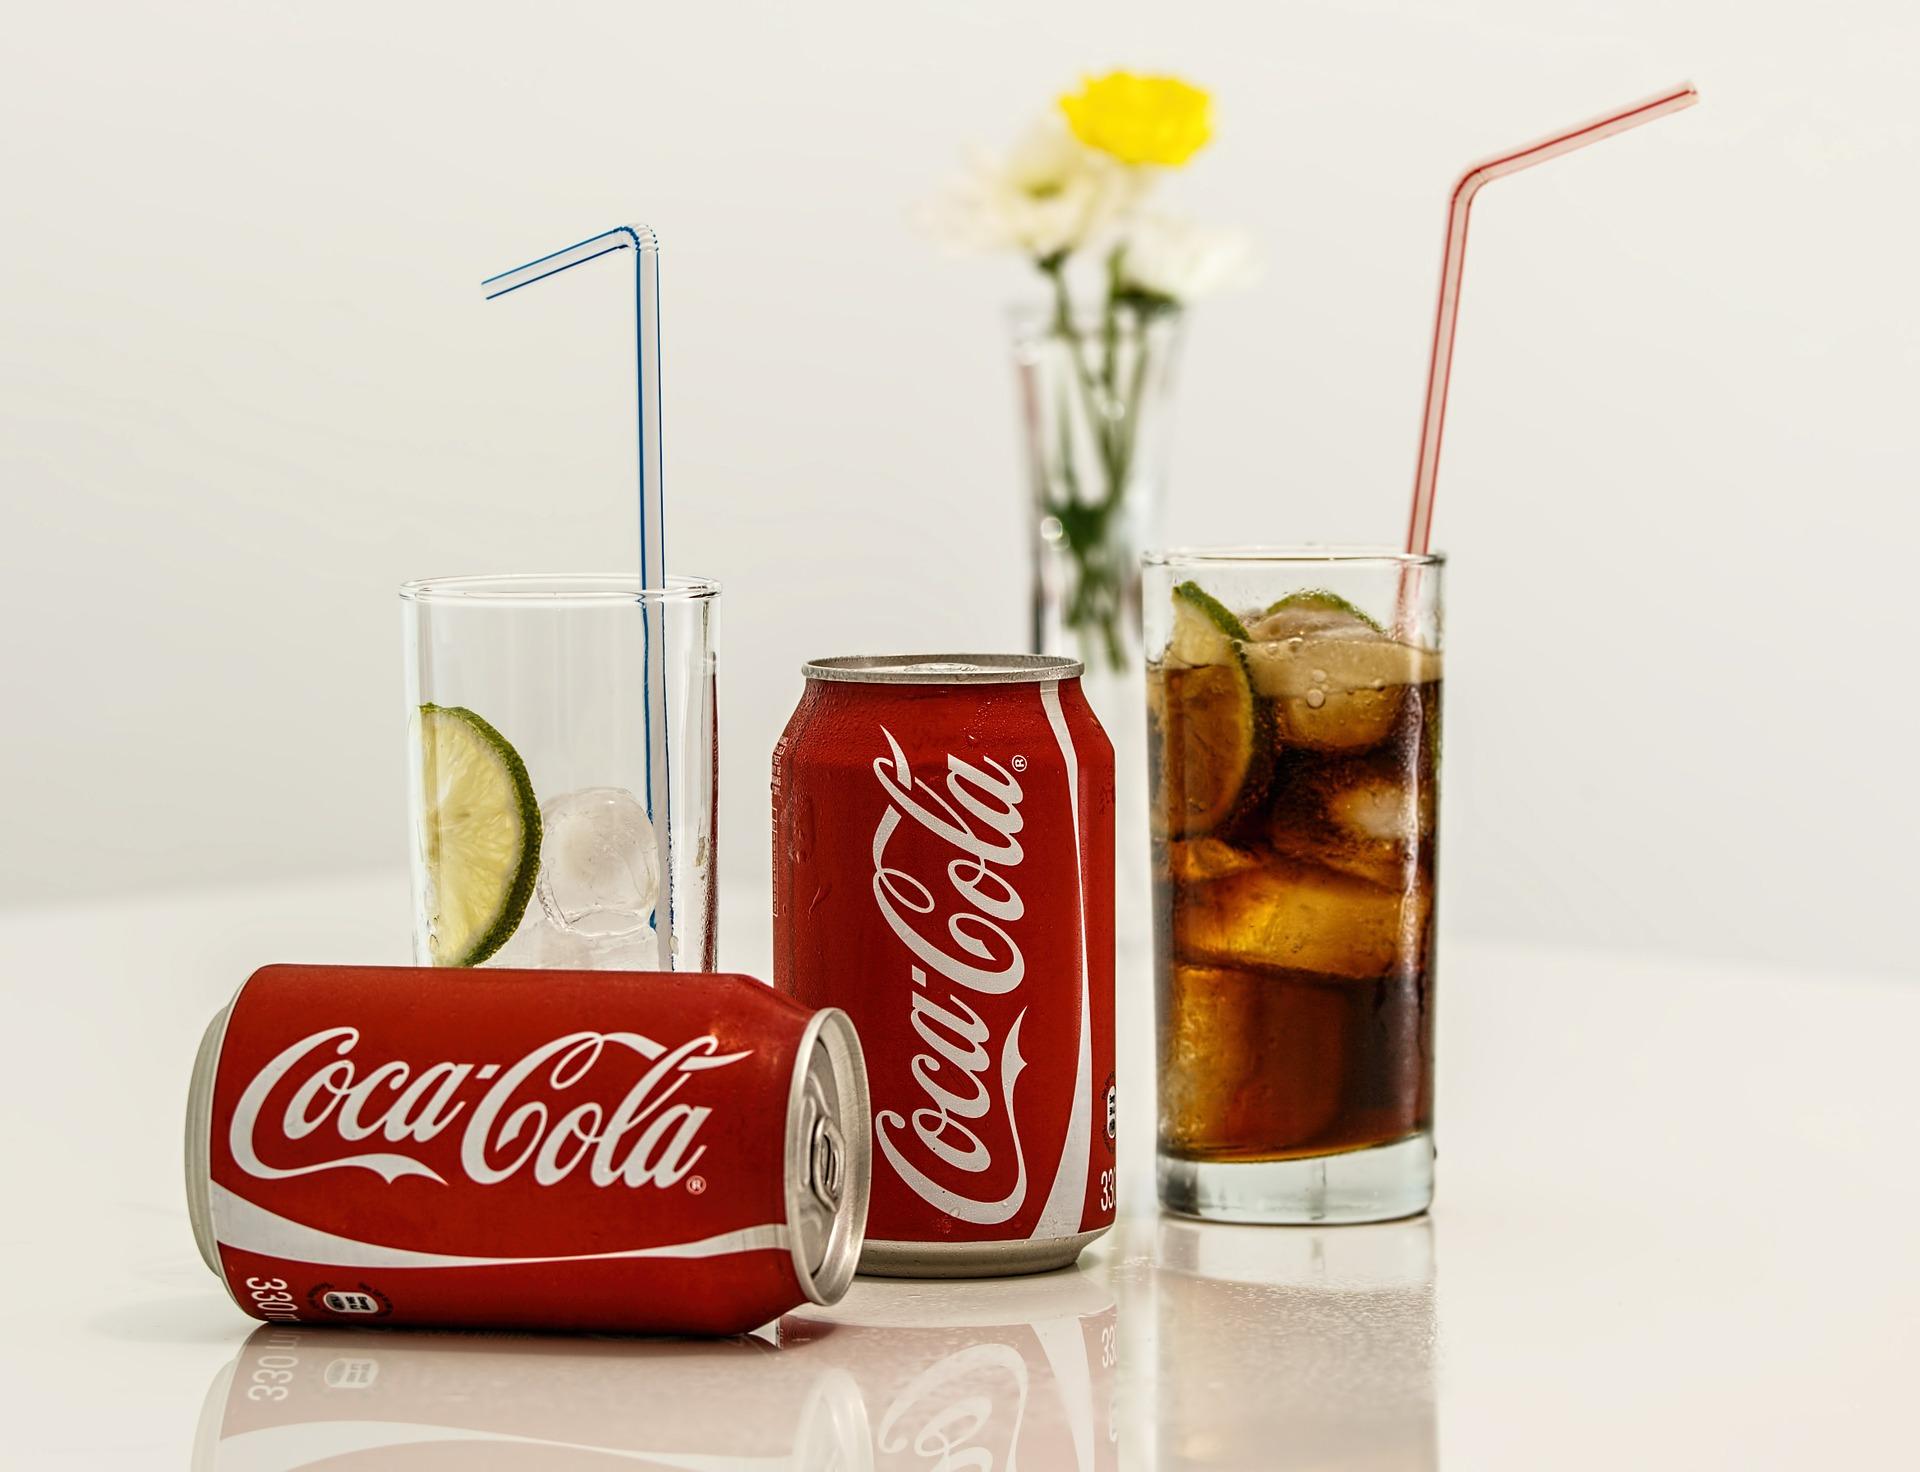 coca-cola-462776_1920.jpg